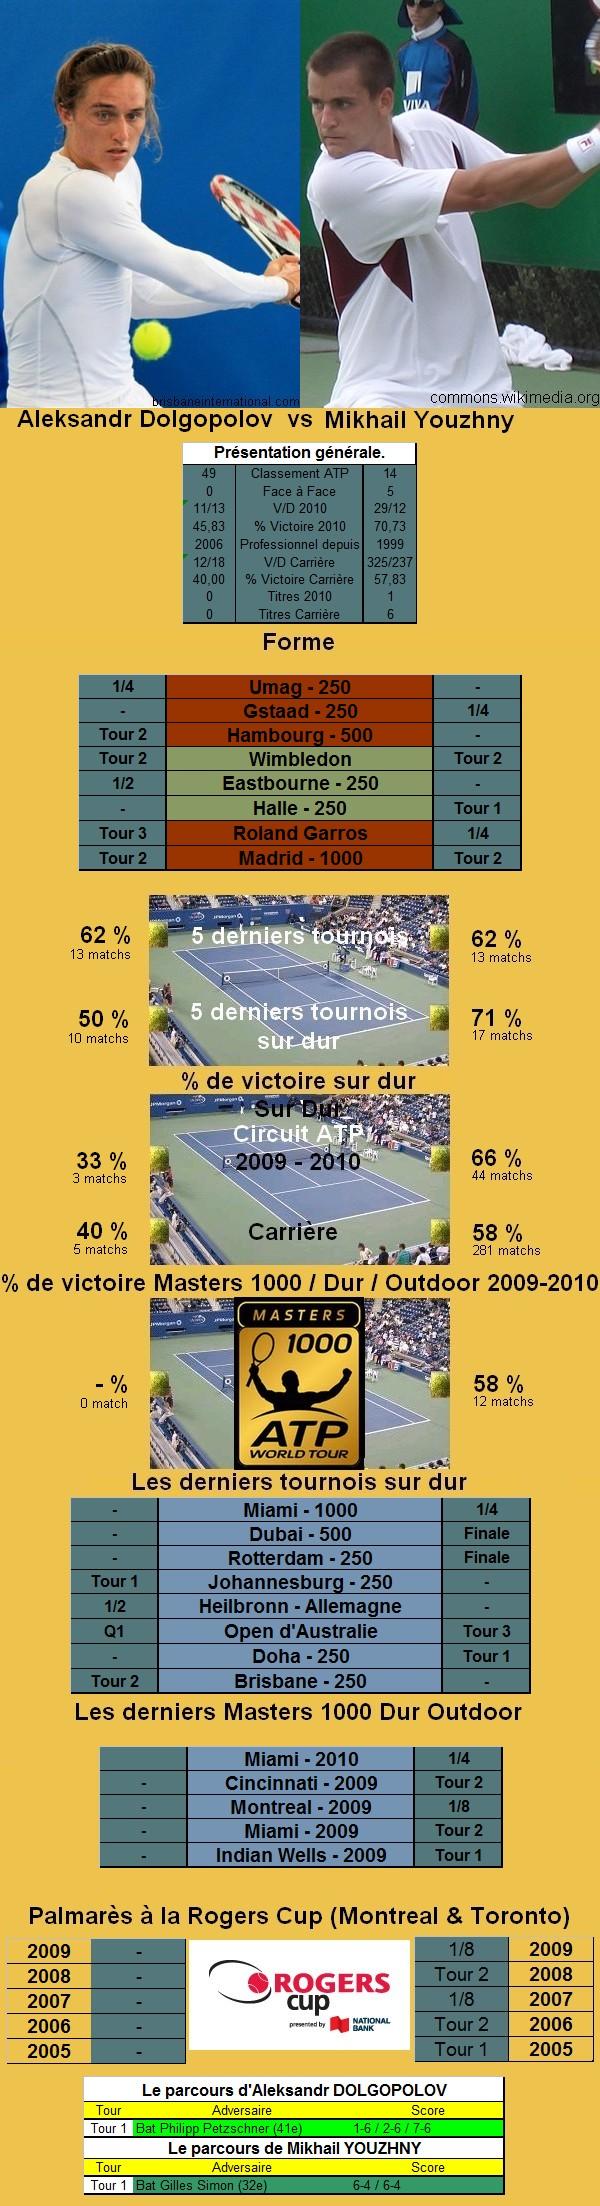 Statistiques tennis de Dolgopolov contre Youzhny à Toronto